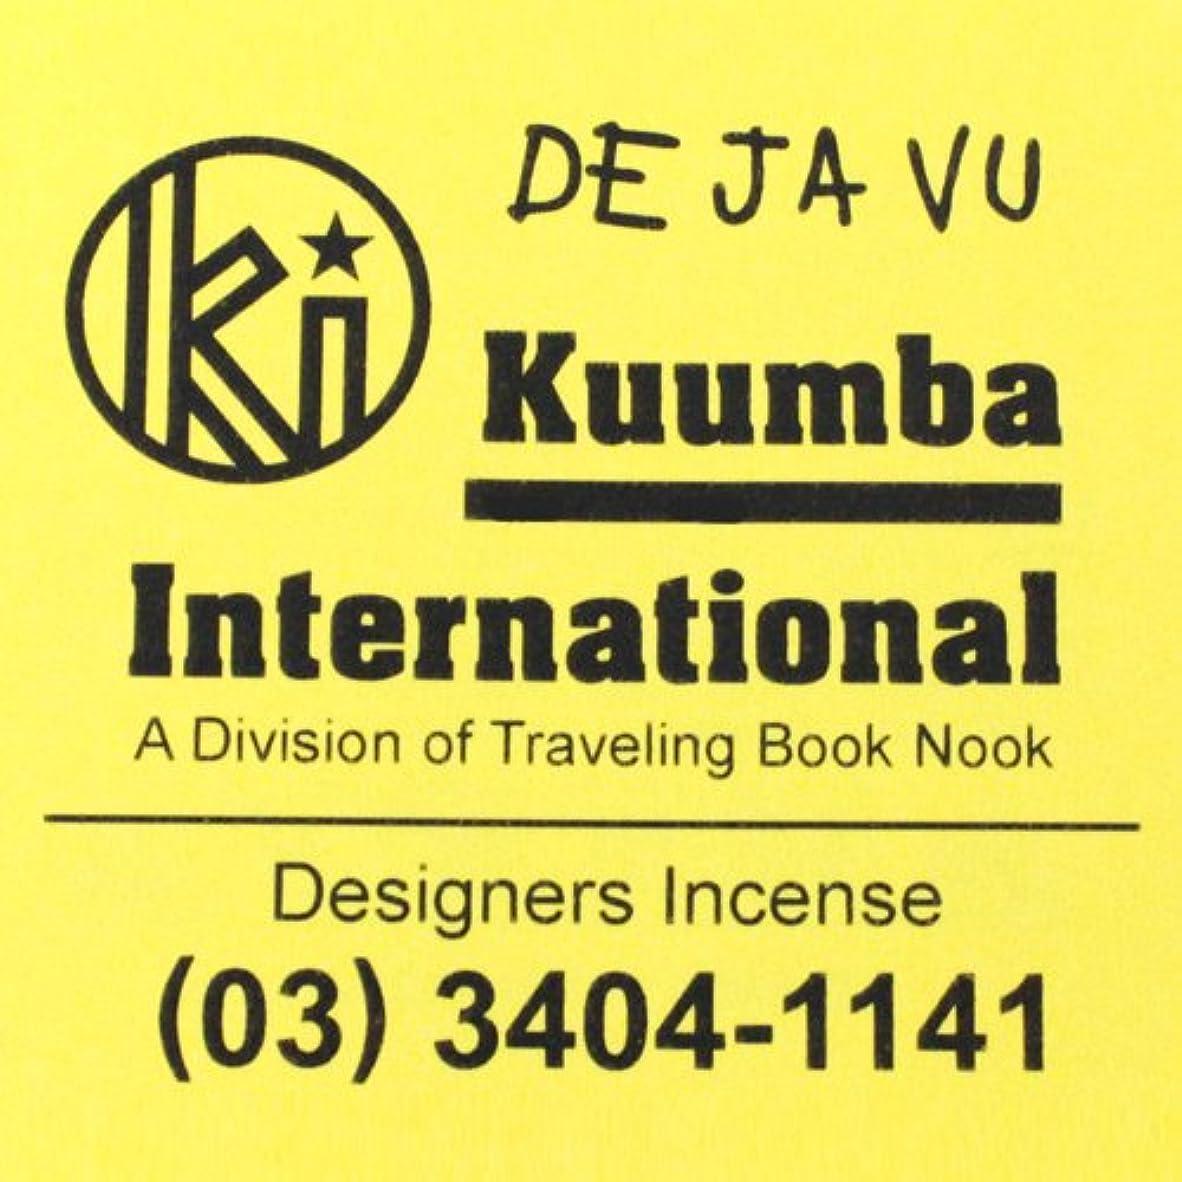 KUUMBA (クンバ)『incense』(DE JA VU) (Regular size)